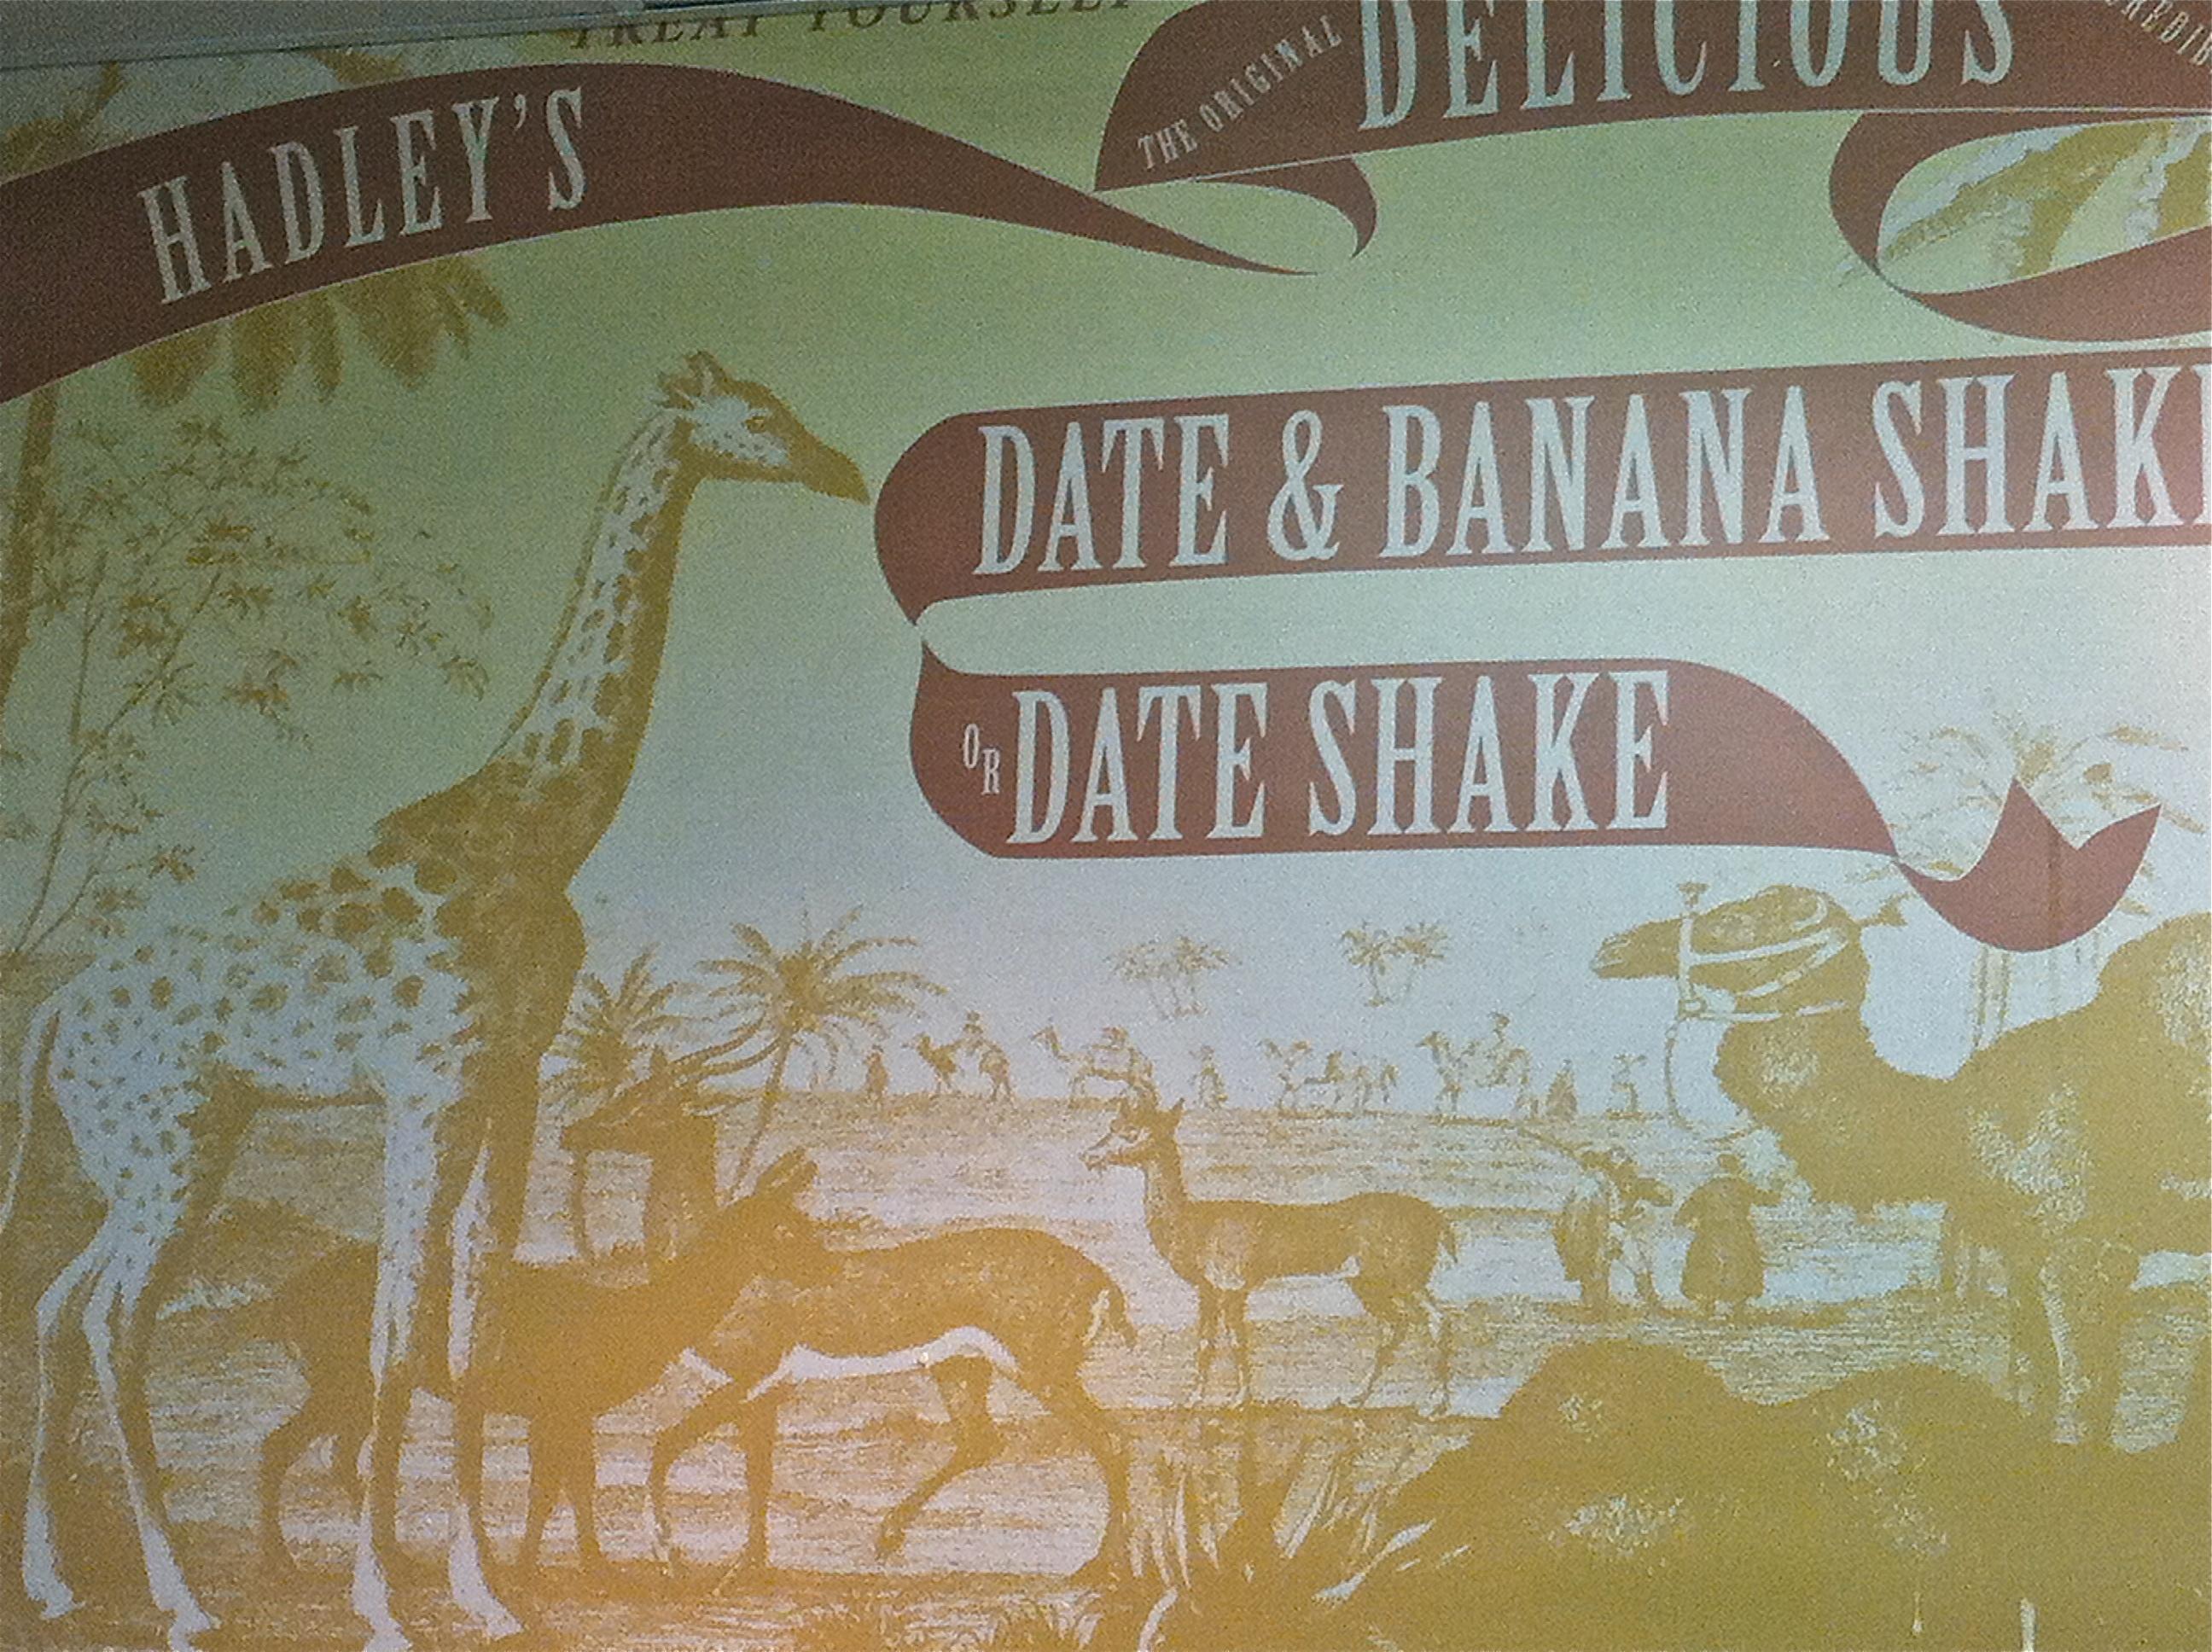 Hadley's date shake in Brisbane